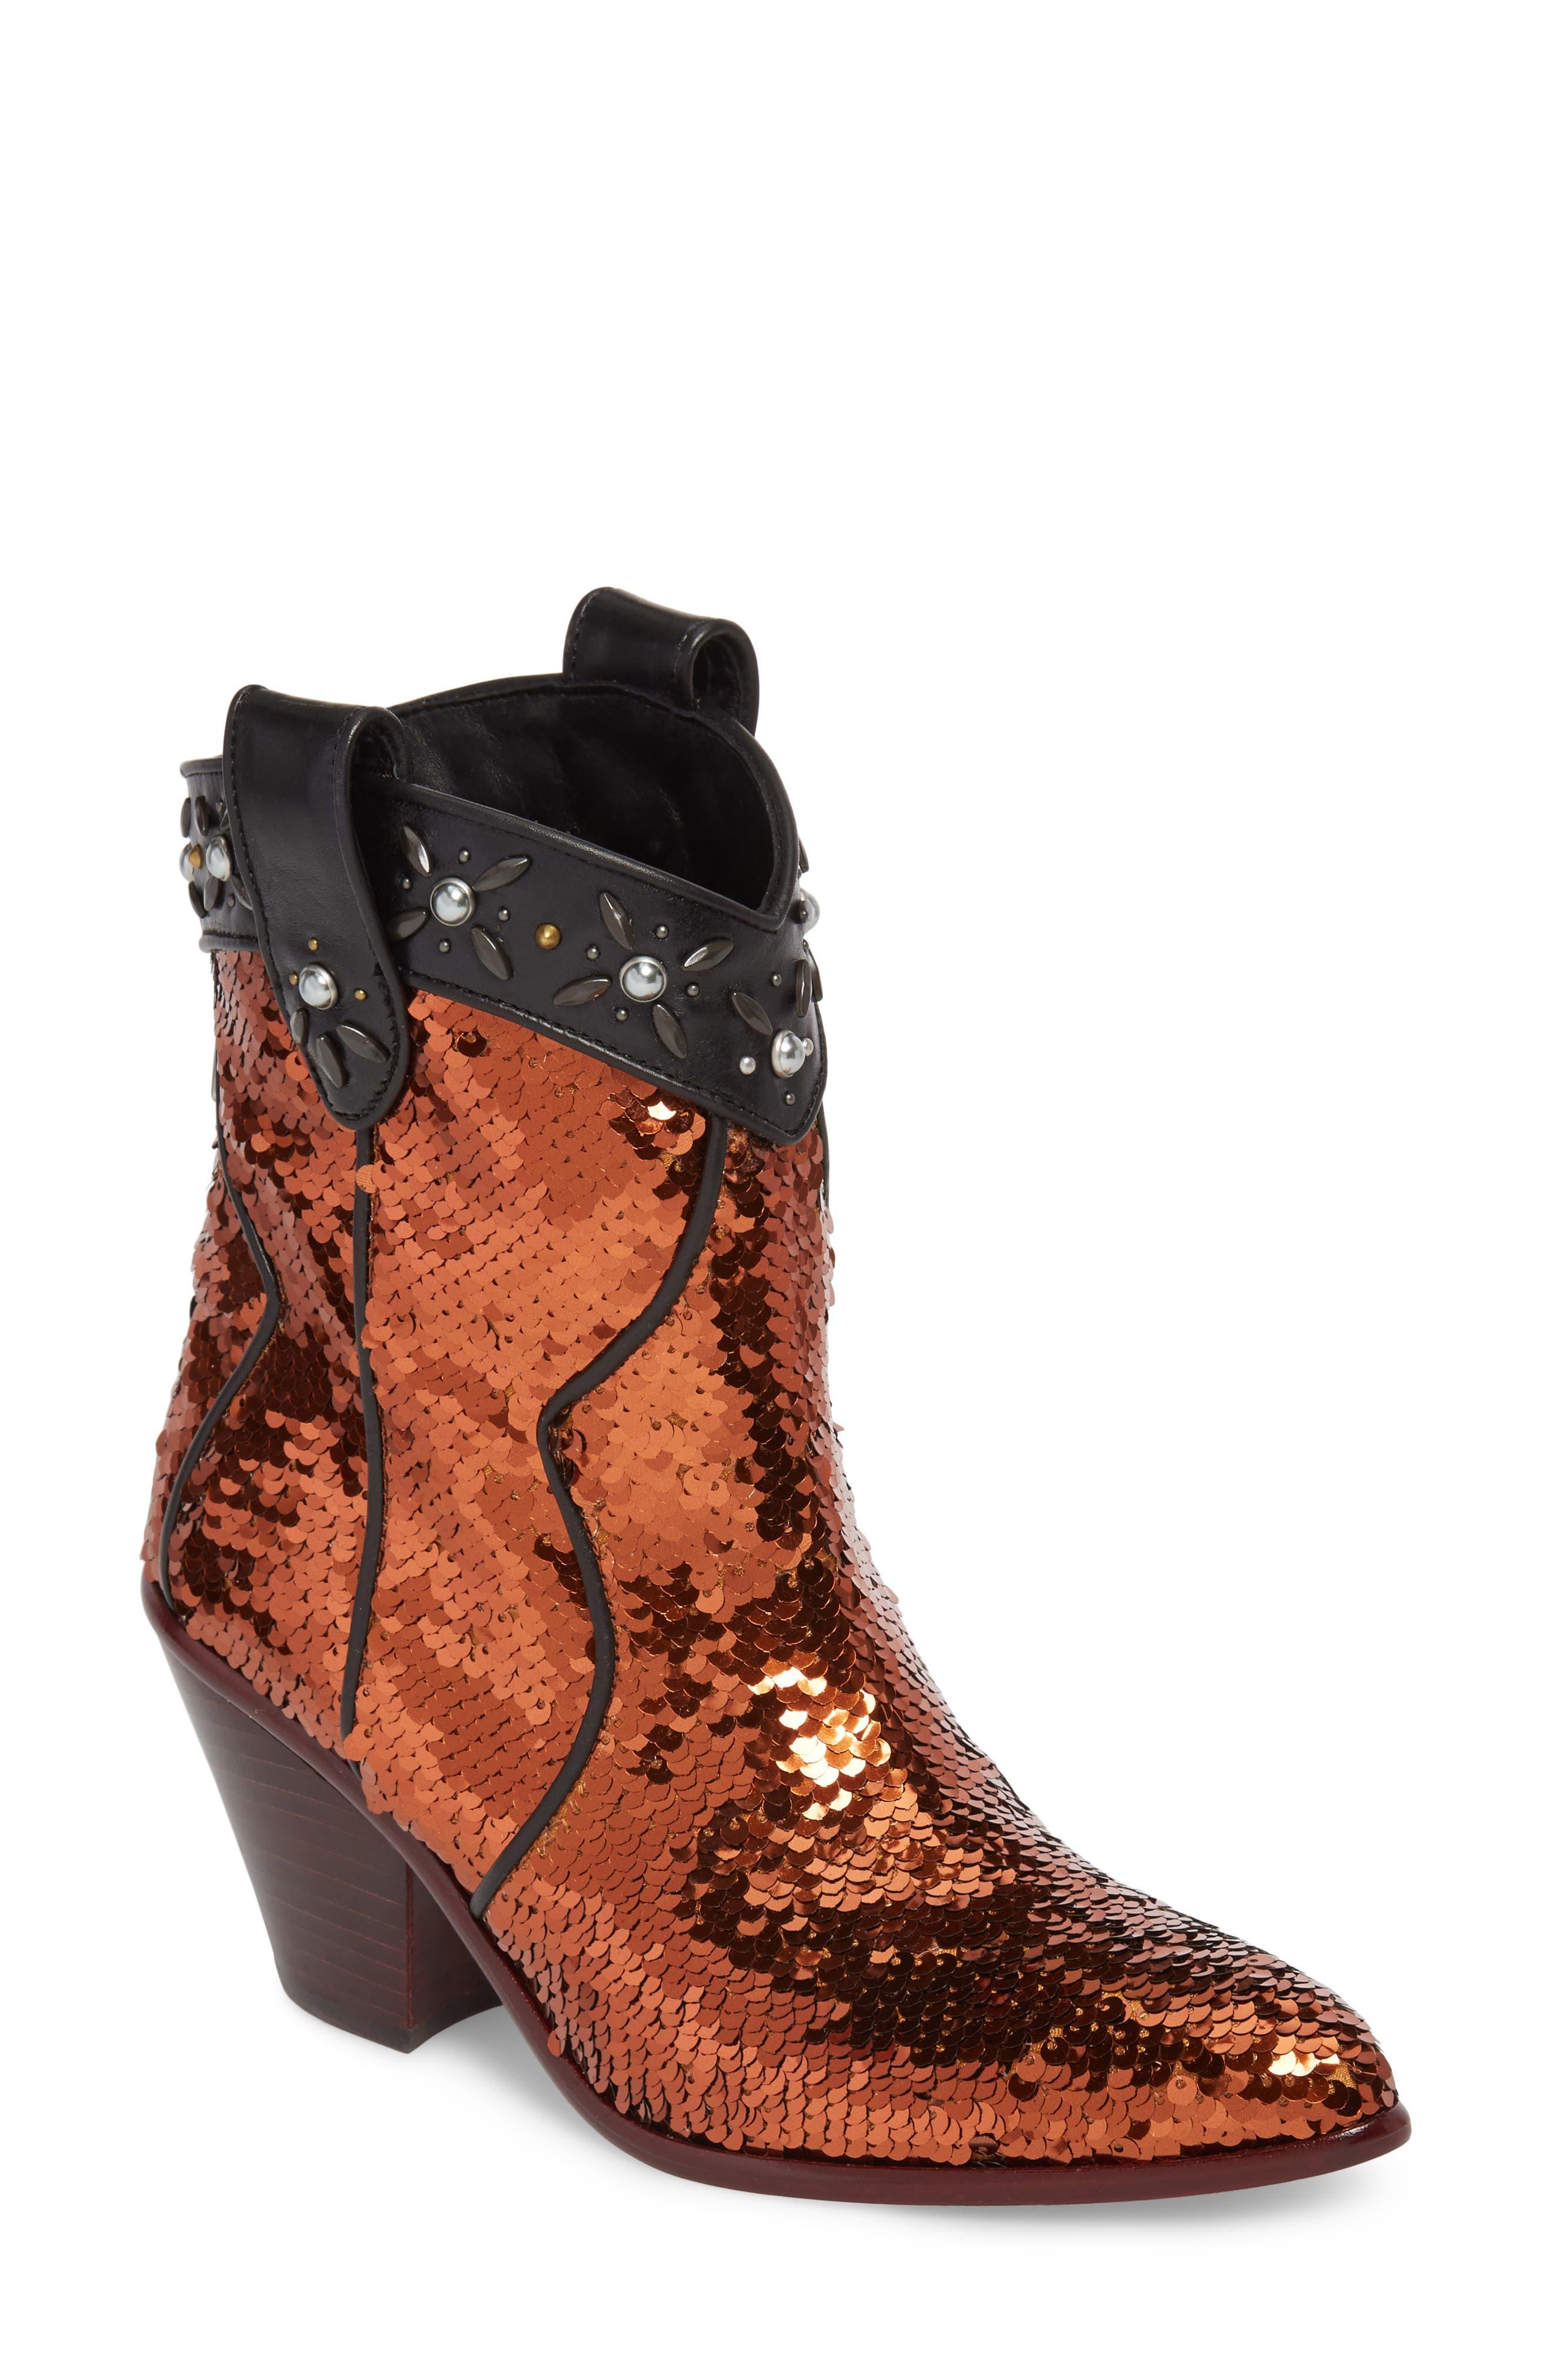 Main Image - COACH Sequin Embellished Western Bootie (Women)